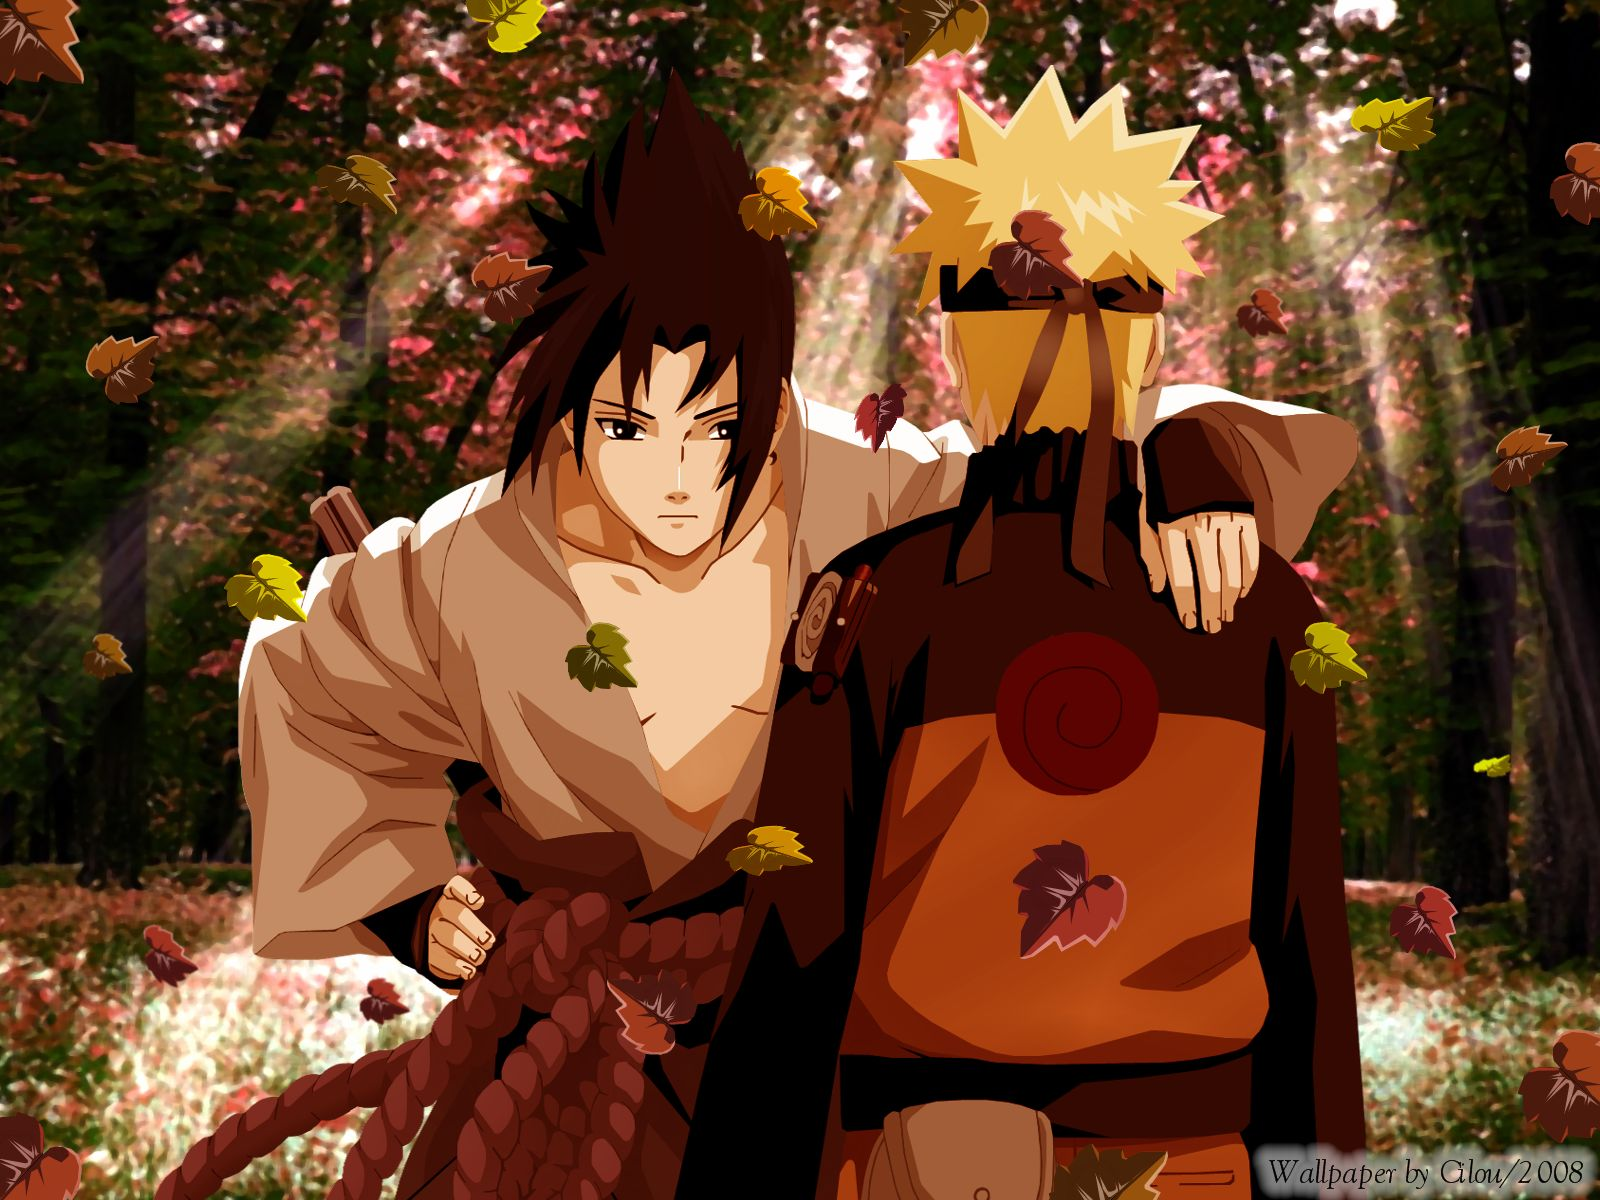 76+] Naruto Best Wallpapers on WallpaperSafari